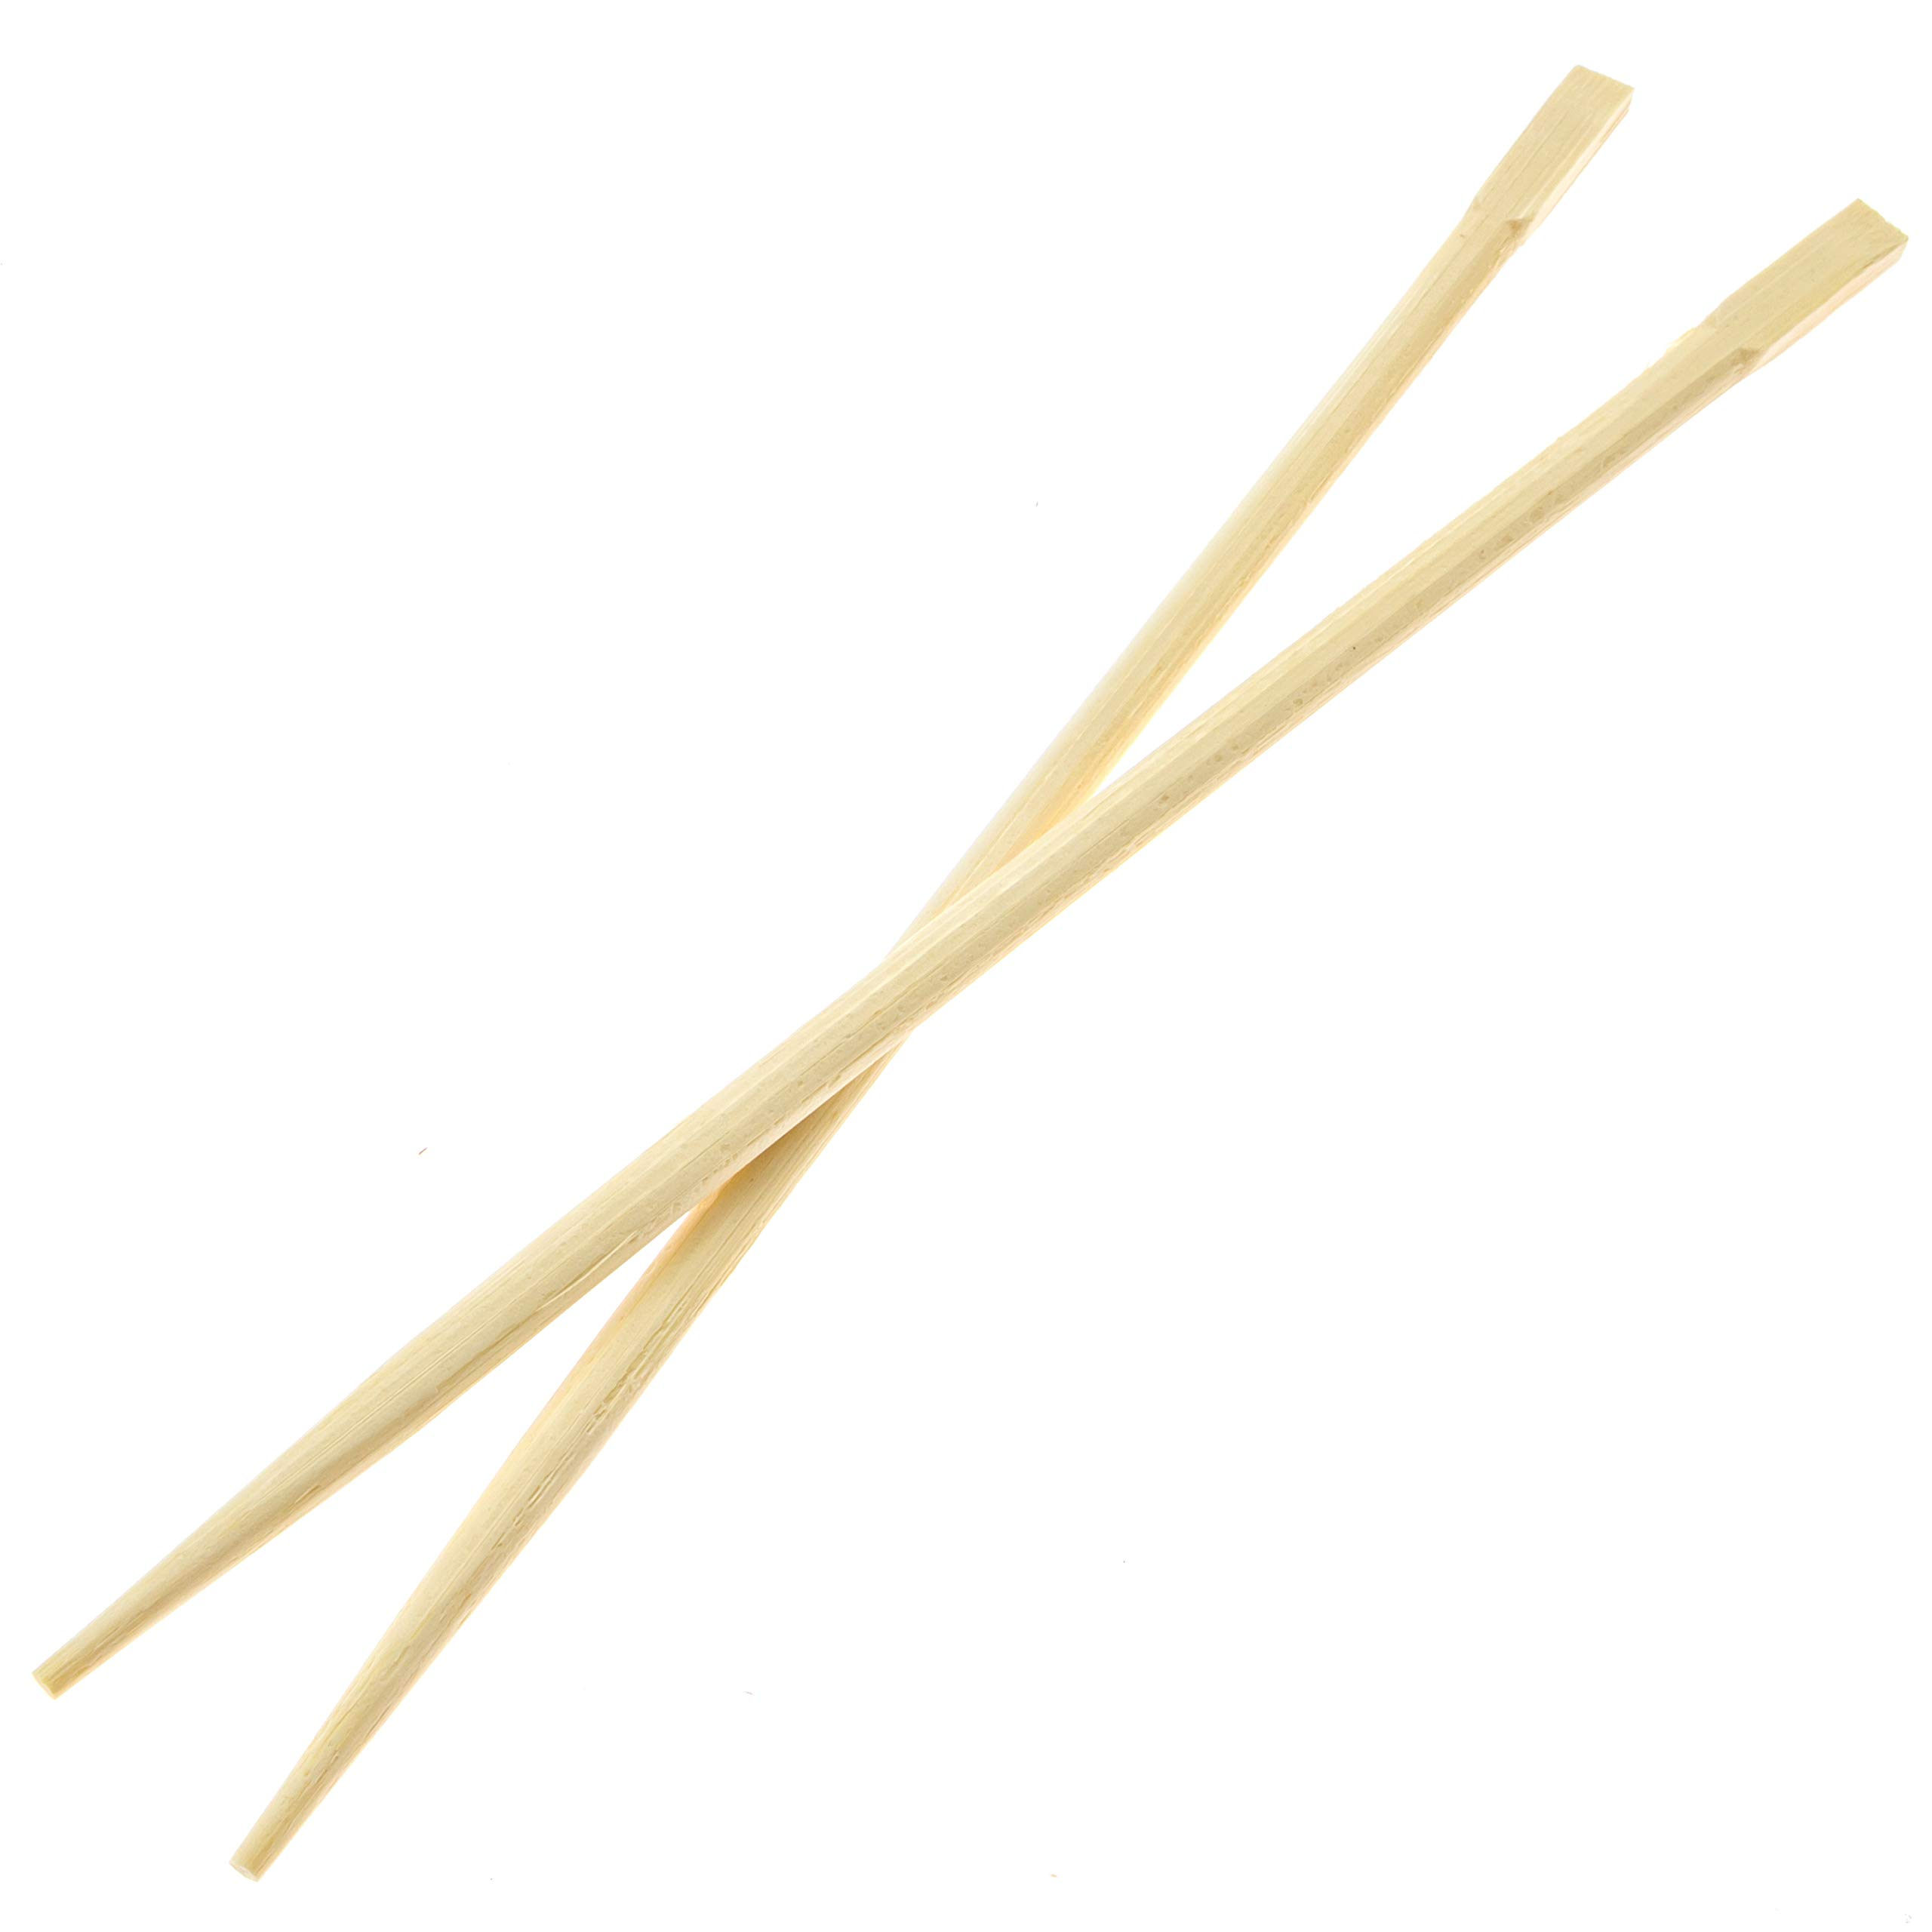 Premium Disposable Bamboo Chopsticks (500 sets), Japanese Disposable Chopsticks Bulk, 9'', Certified Quality by Soeos (Image #4)